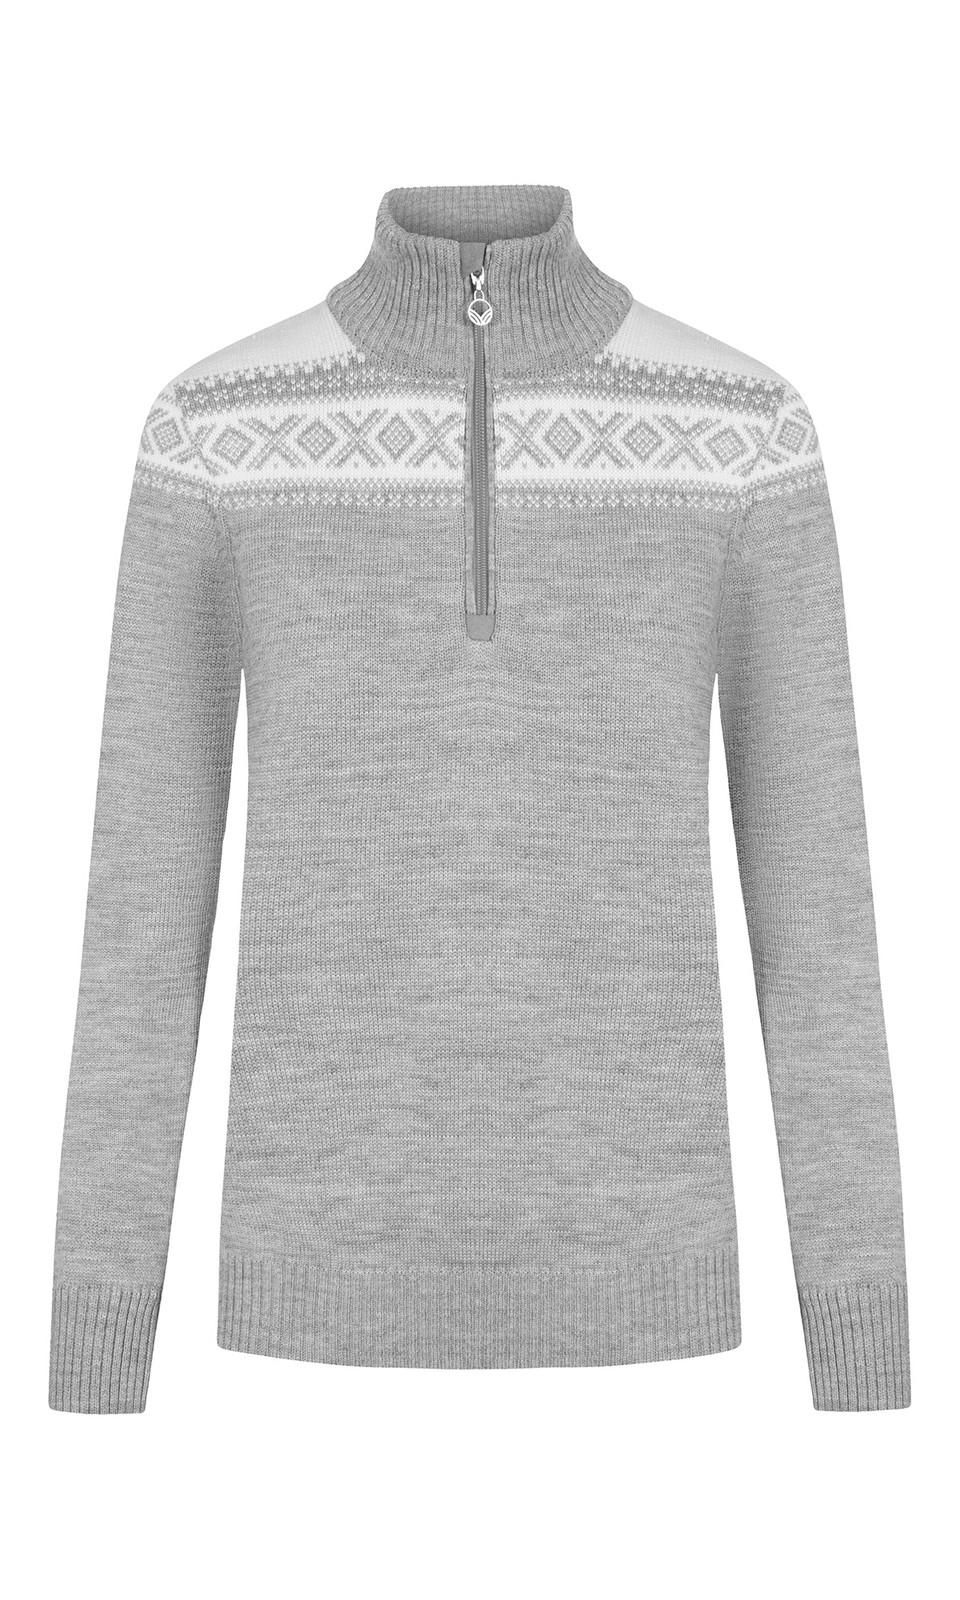 Dale of Norway Cortina Merino Sweater, Ladies - Light Charcoal/Off White, 93811-T